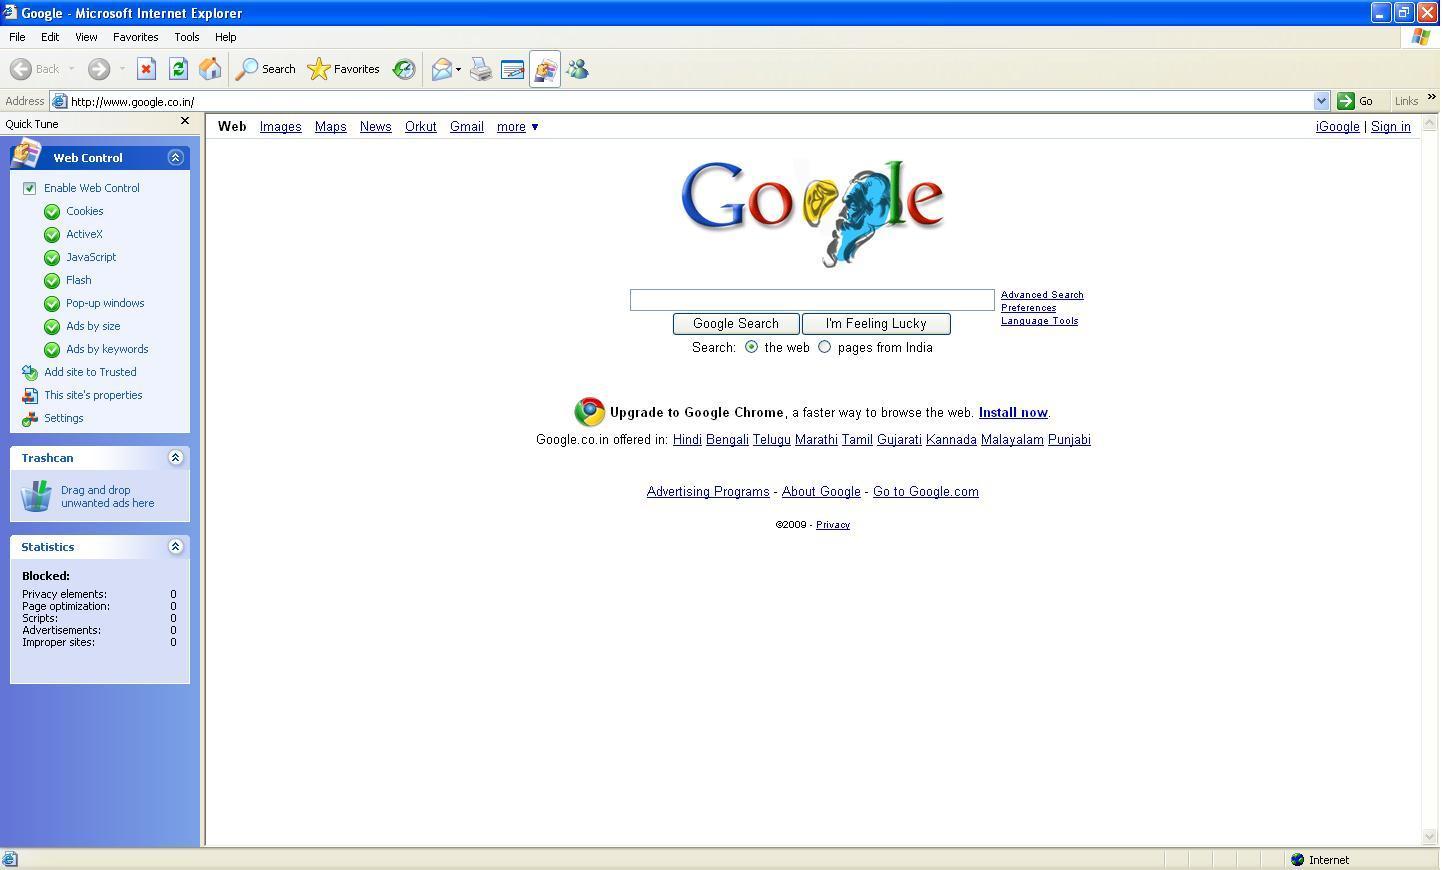 Internet Explorer Security